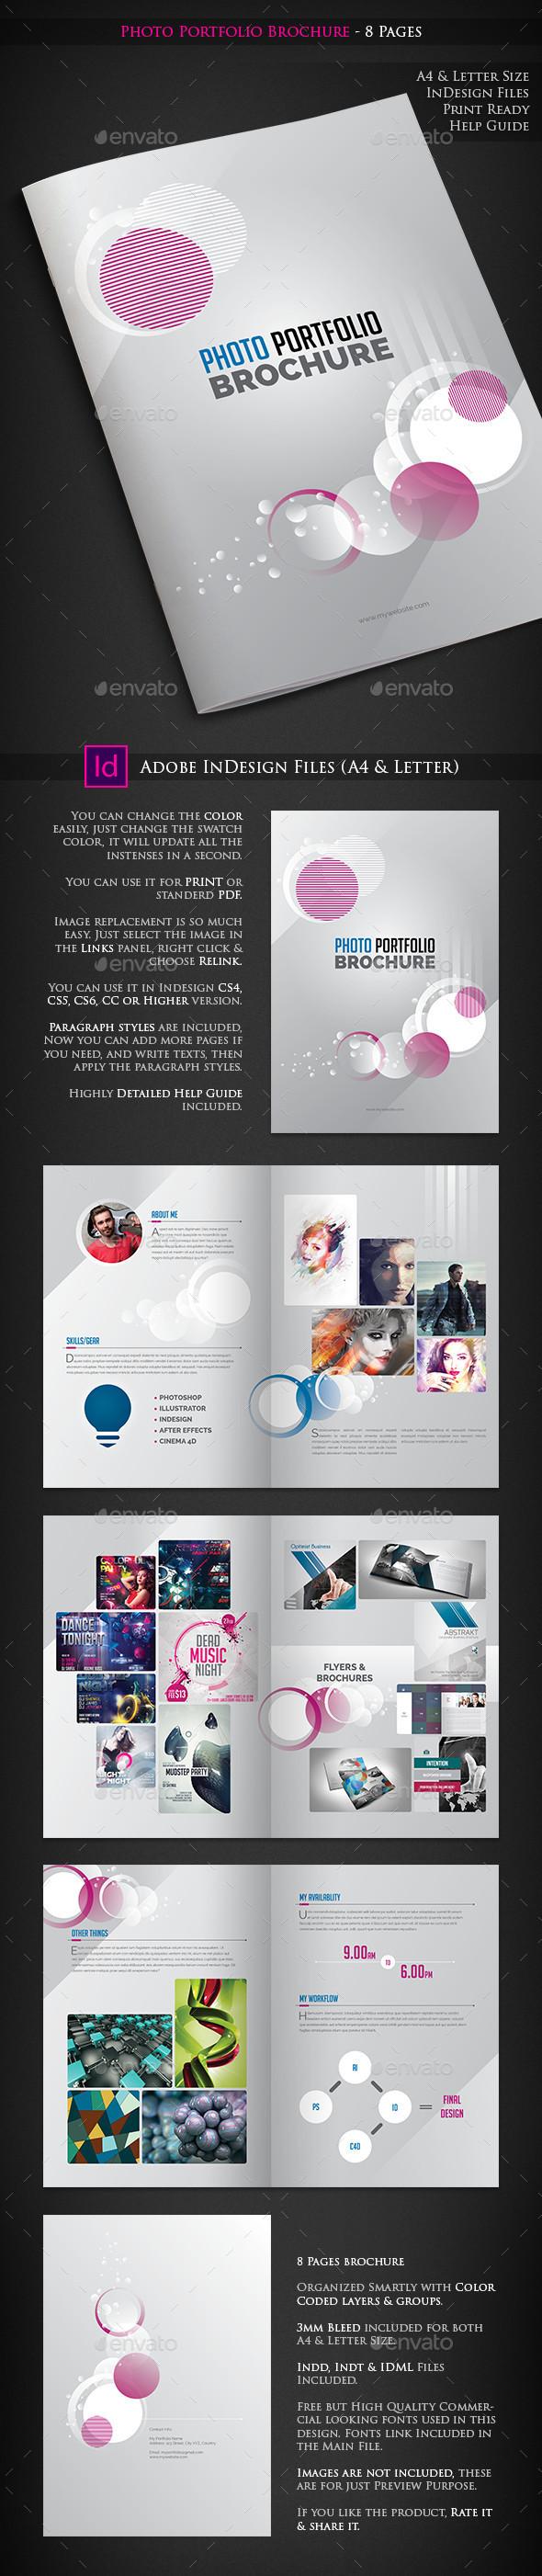 Photo Portfolio Brochure 8 Pages